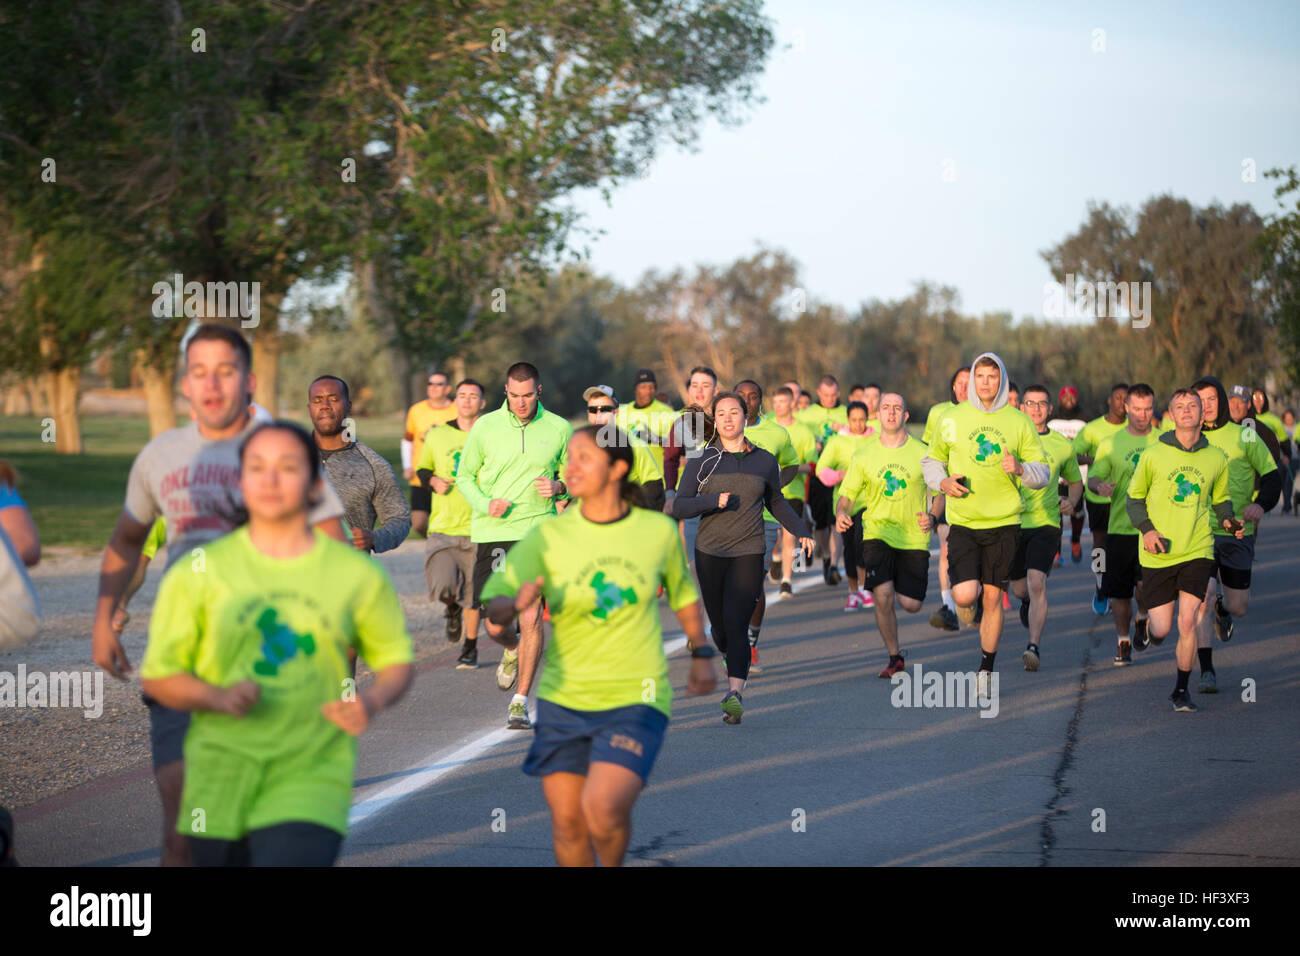 Combat Center patrons run through the Desert Winds Golf Course during the annual Earth Day 5K Fun Run April 15, - Stock Image